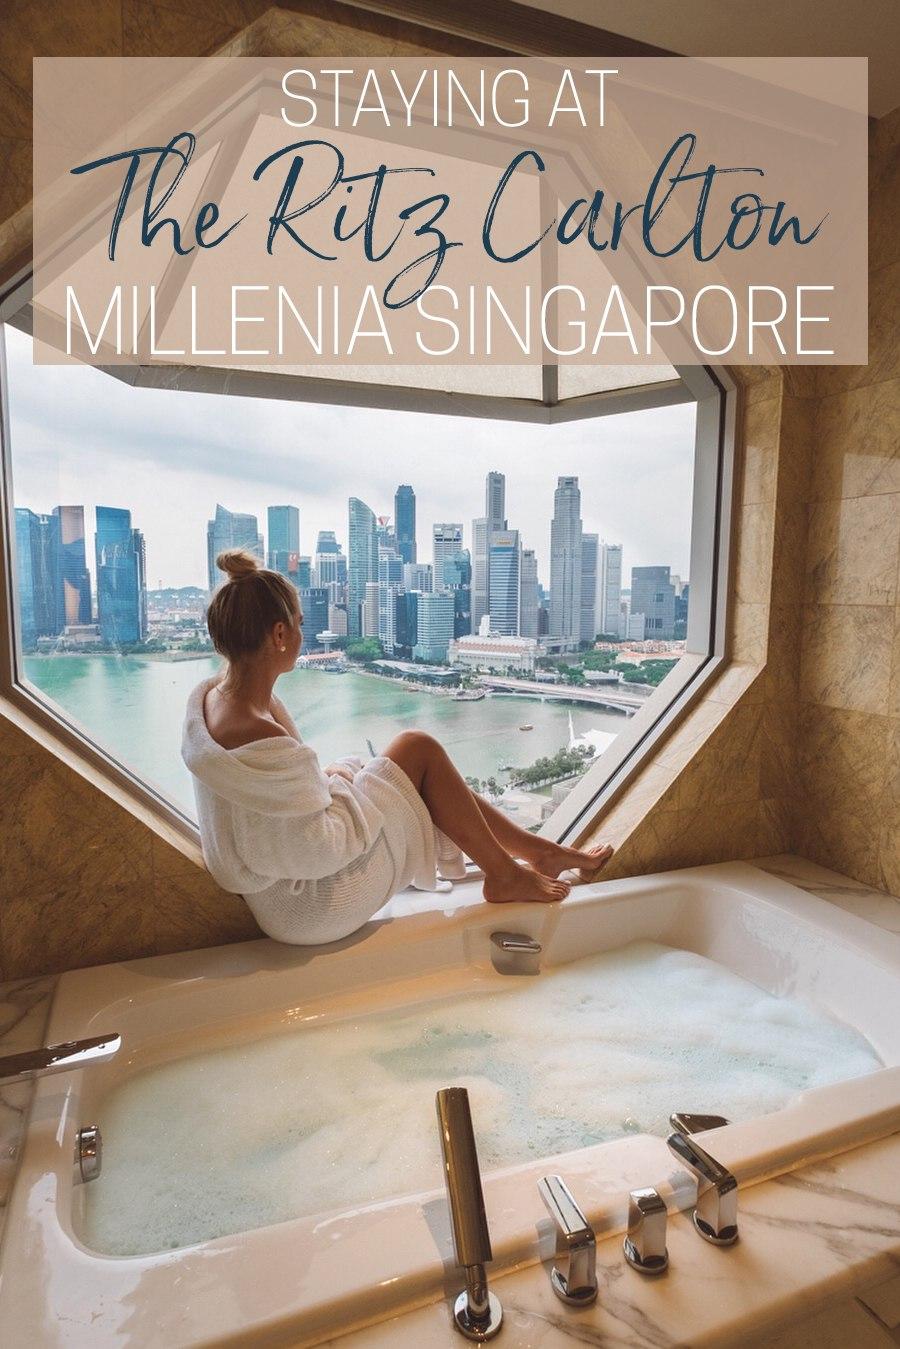 Staying at the Ritz-Carlton Millenia Singapore